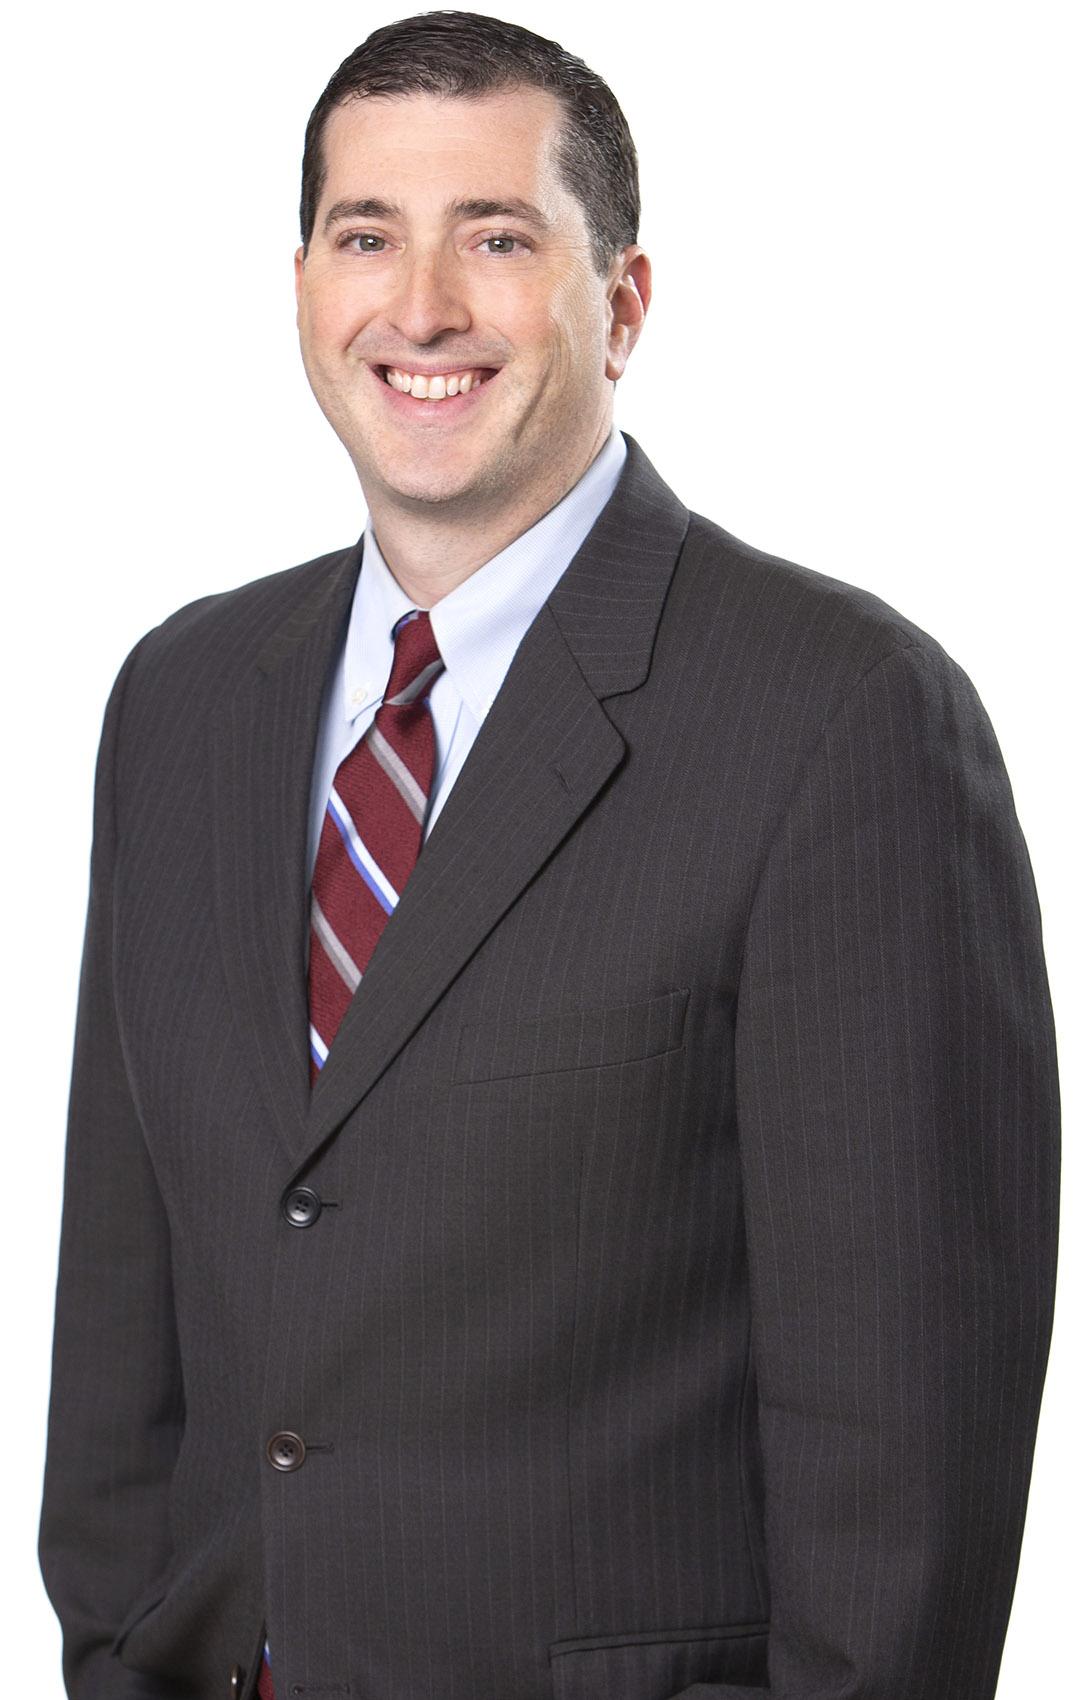 Alan F. Kaufman